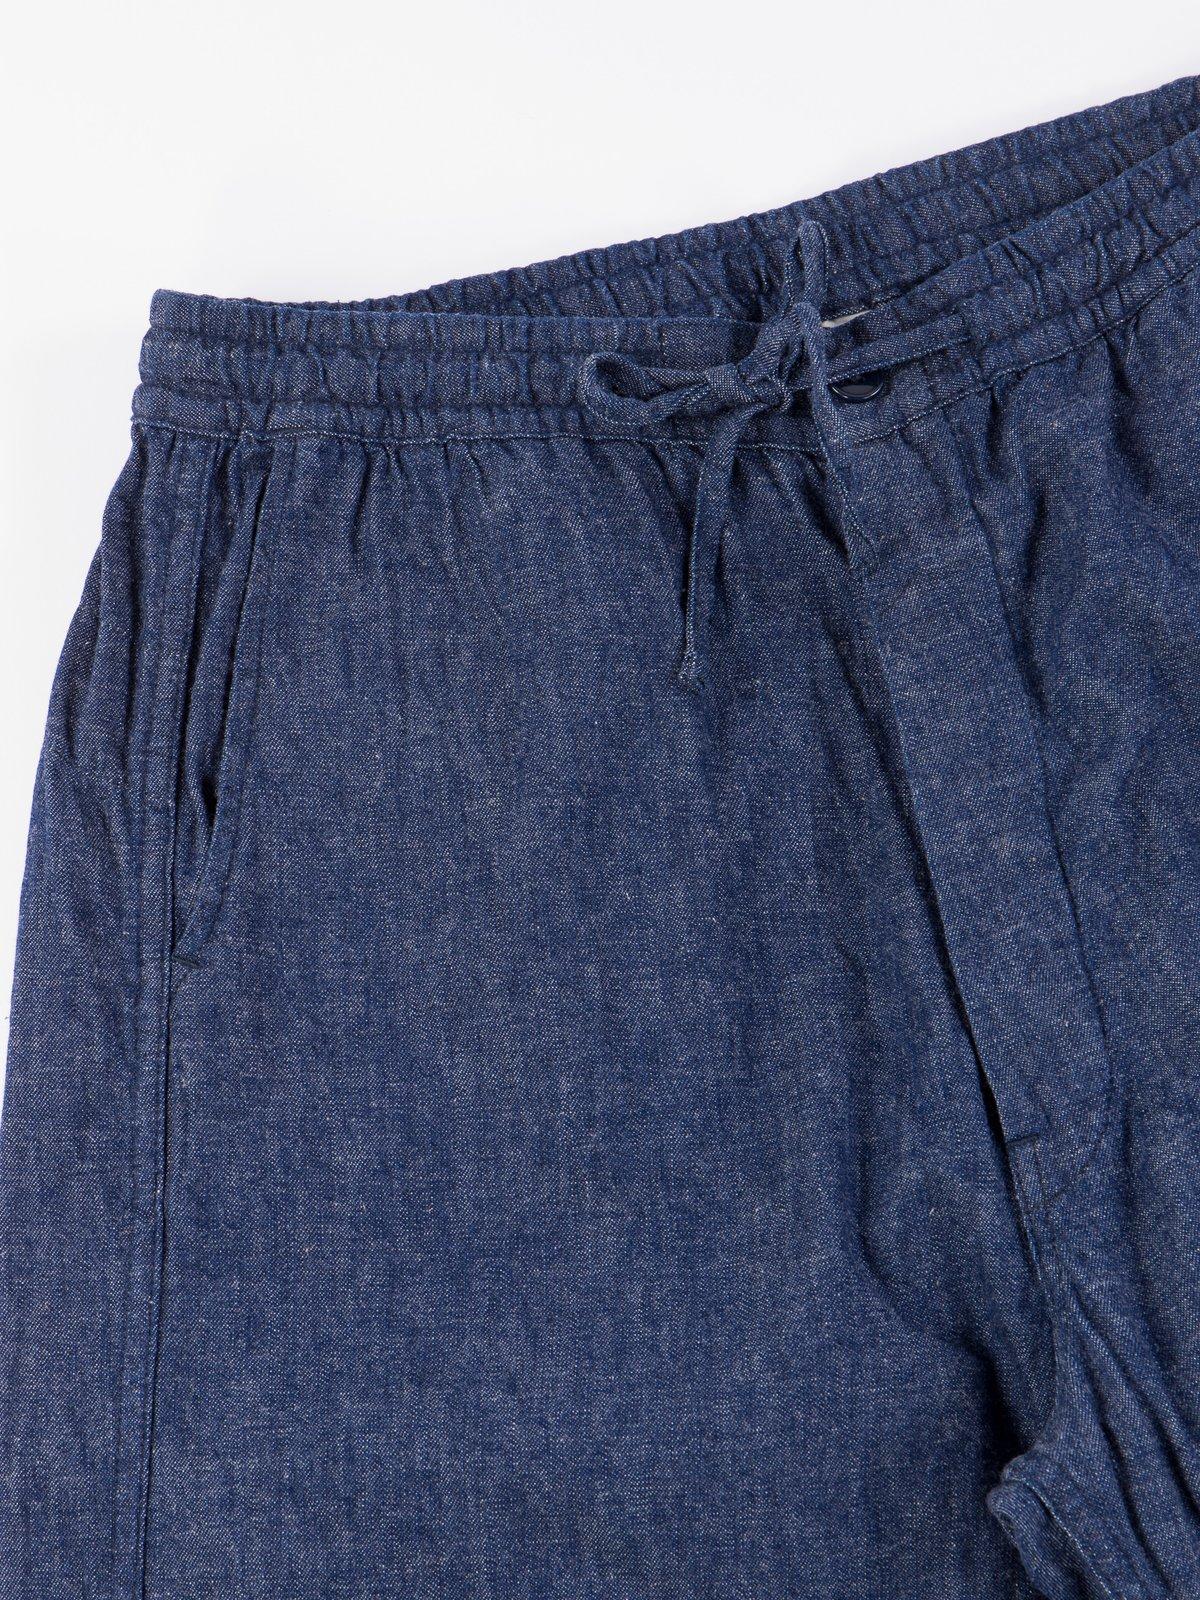 One Wash Denim Takumi Pant - Image 2